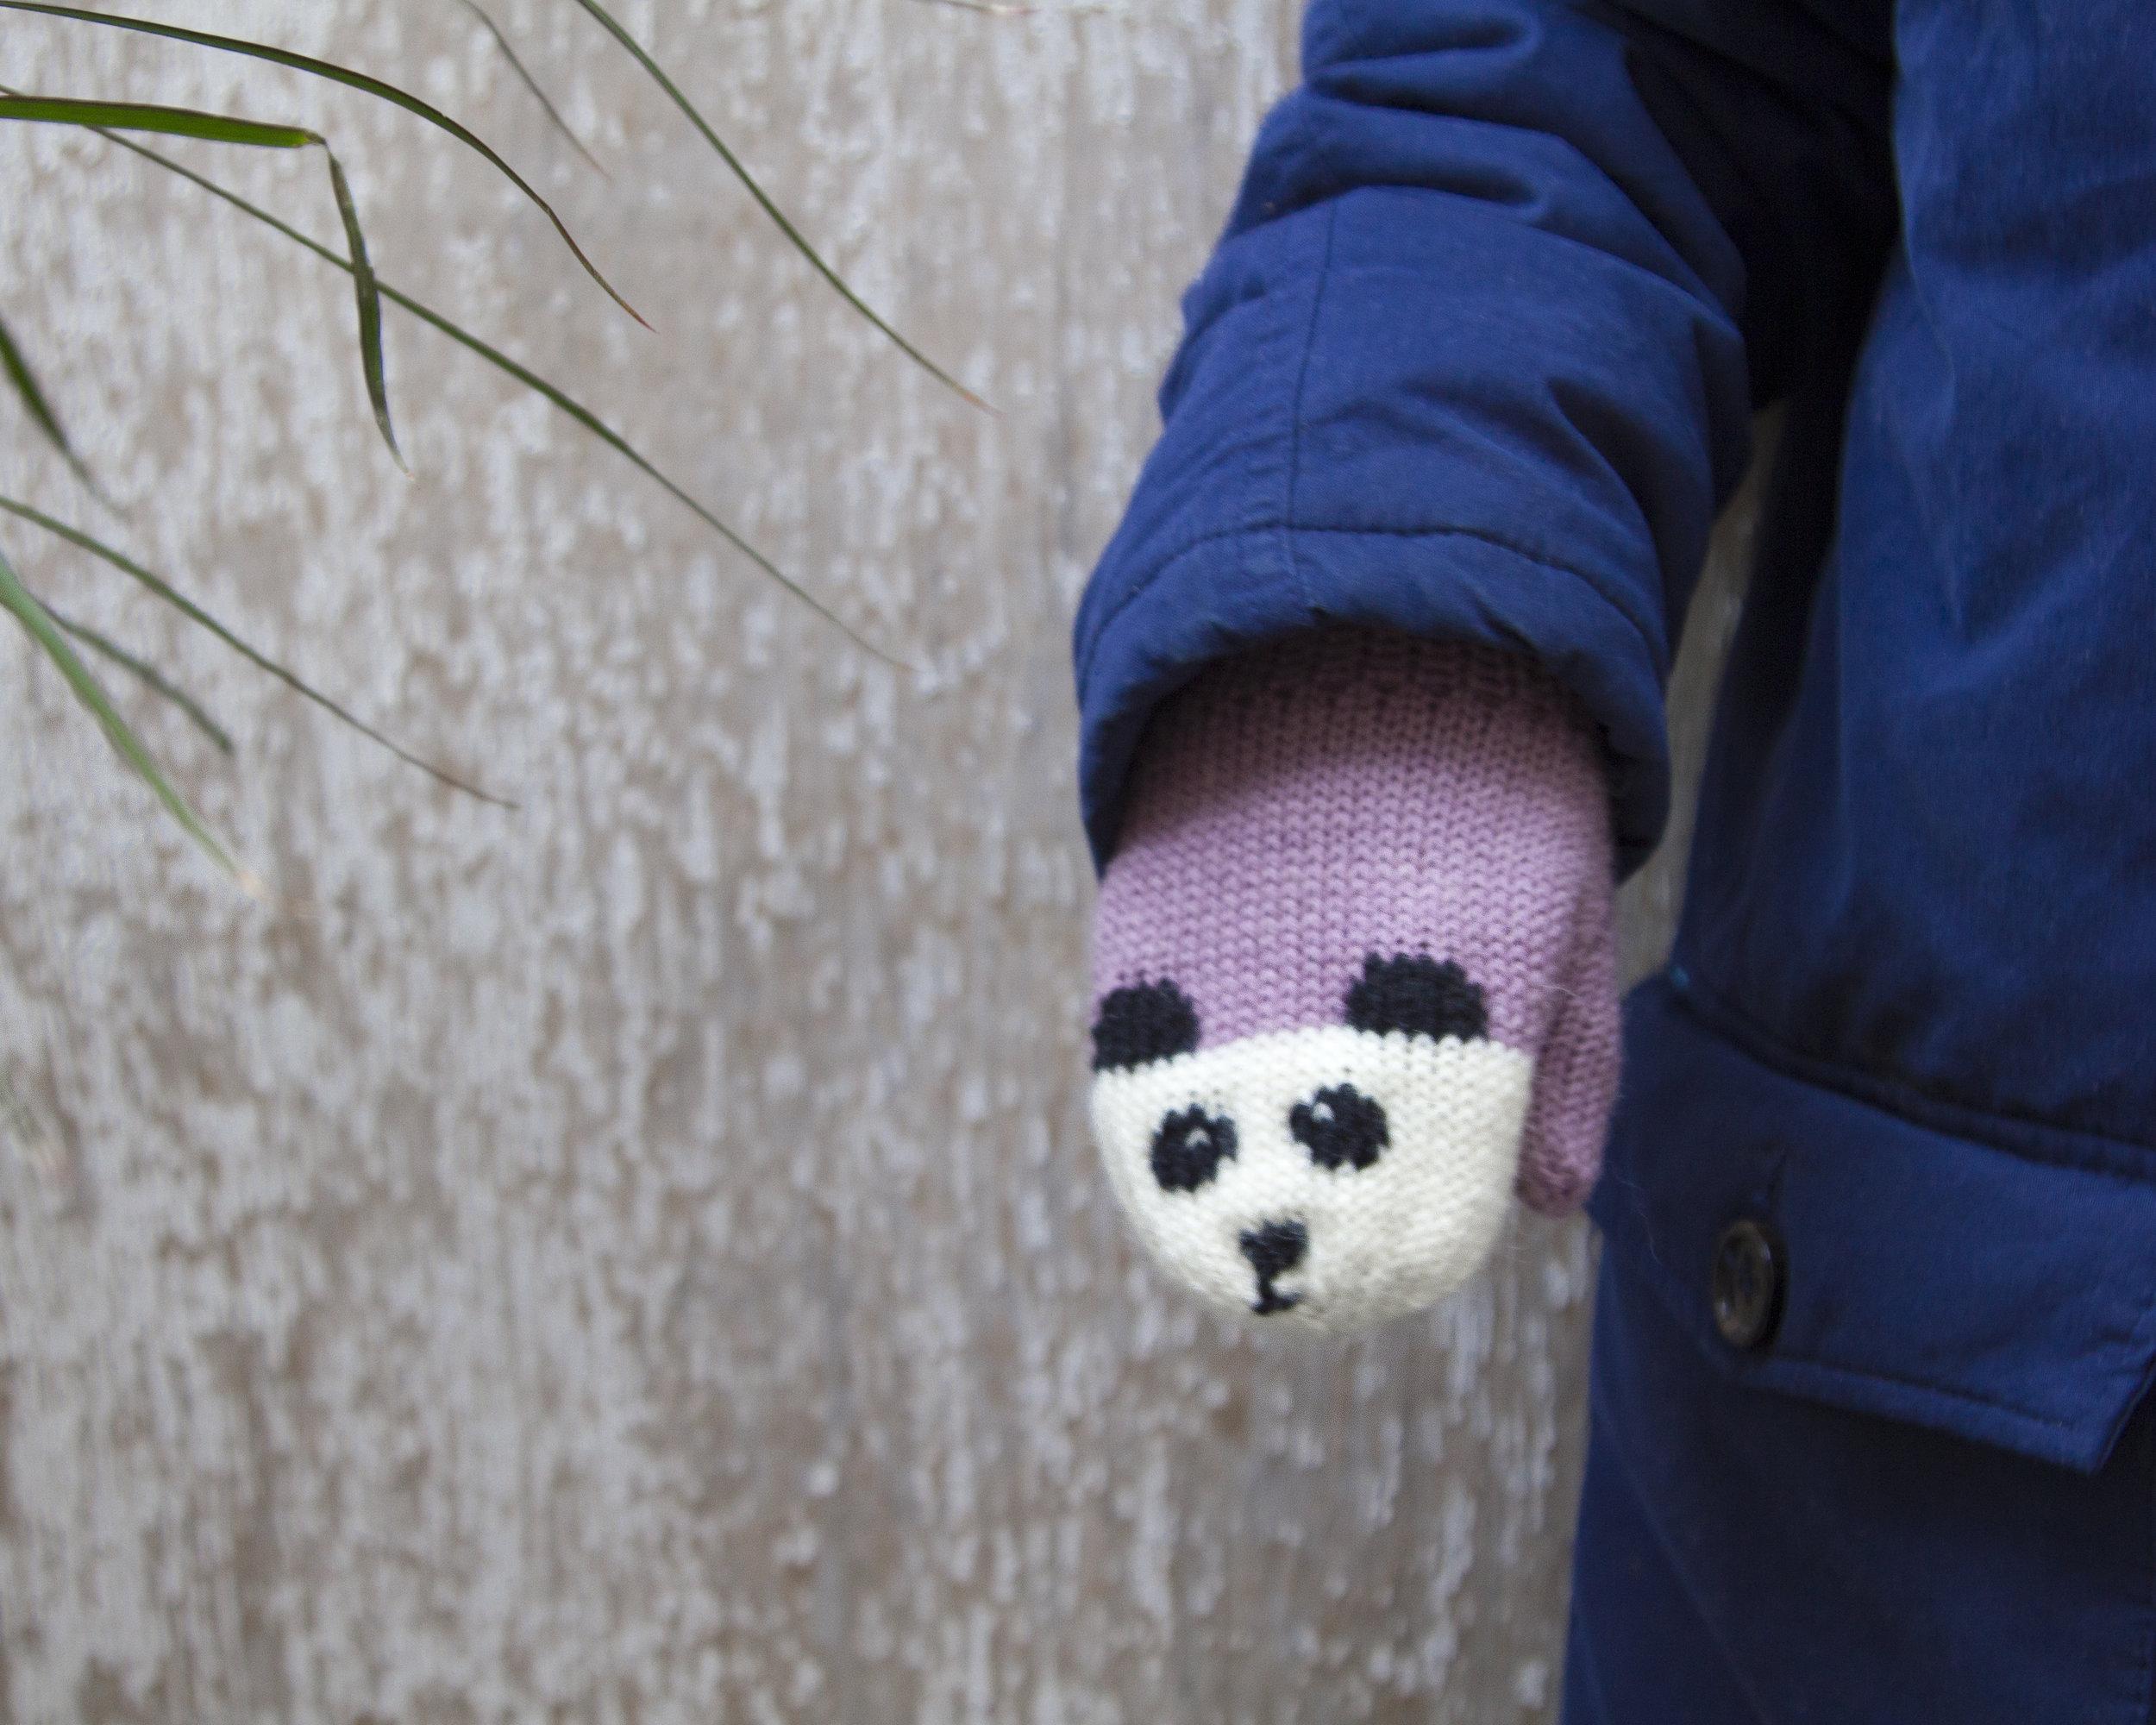 Purple Panda mittens for kids.jpg